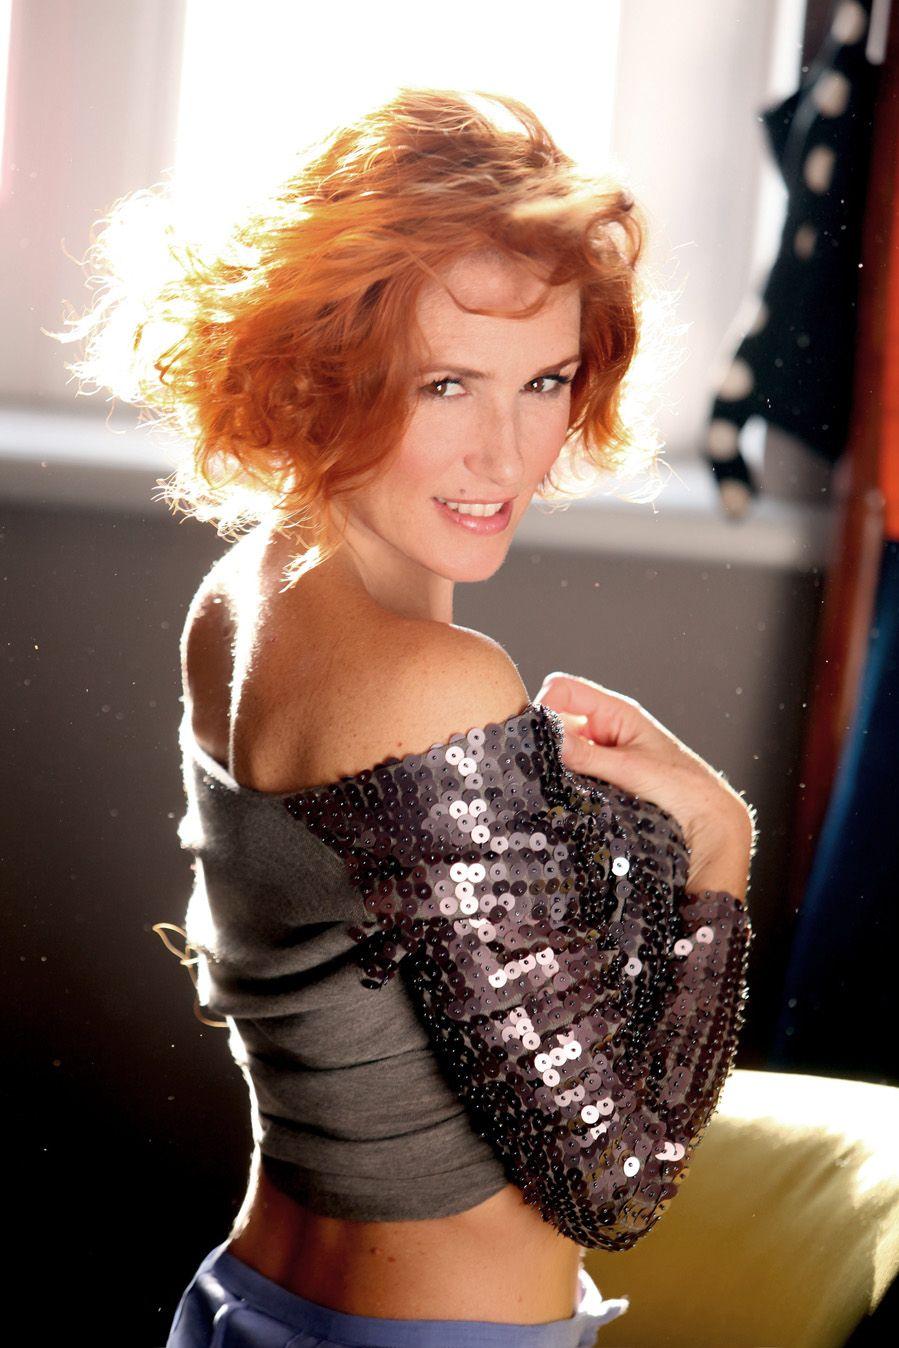 Bridget Everett born April 21, 1972 (age 46) picture